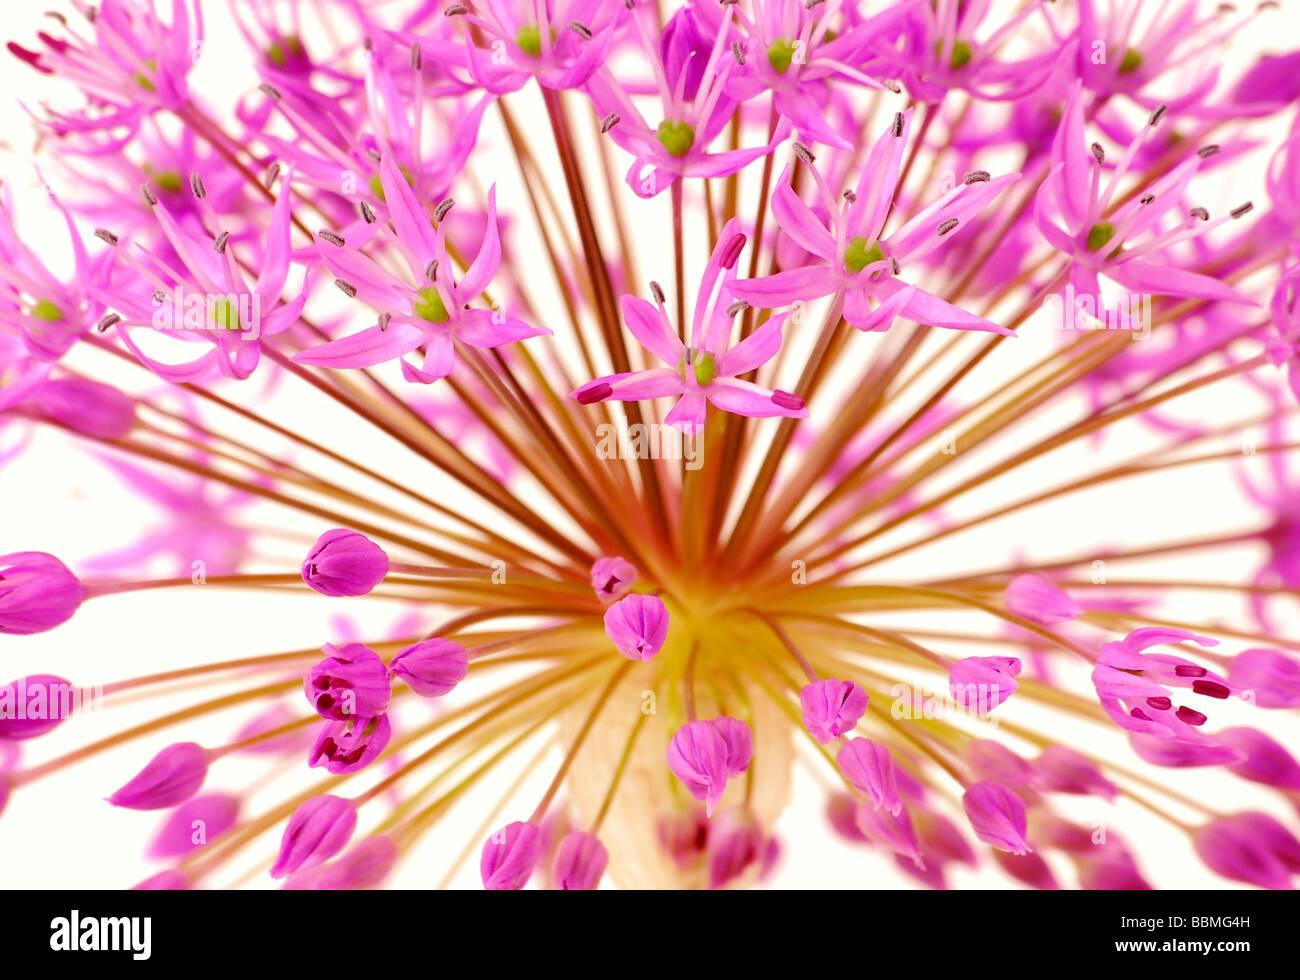 Ornamental chive or Allium flower - Stock Image